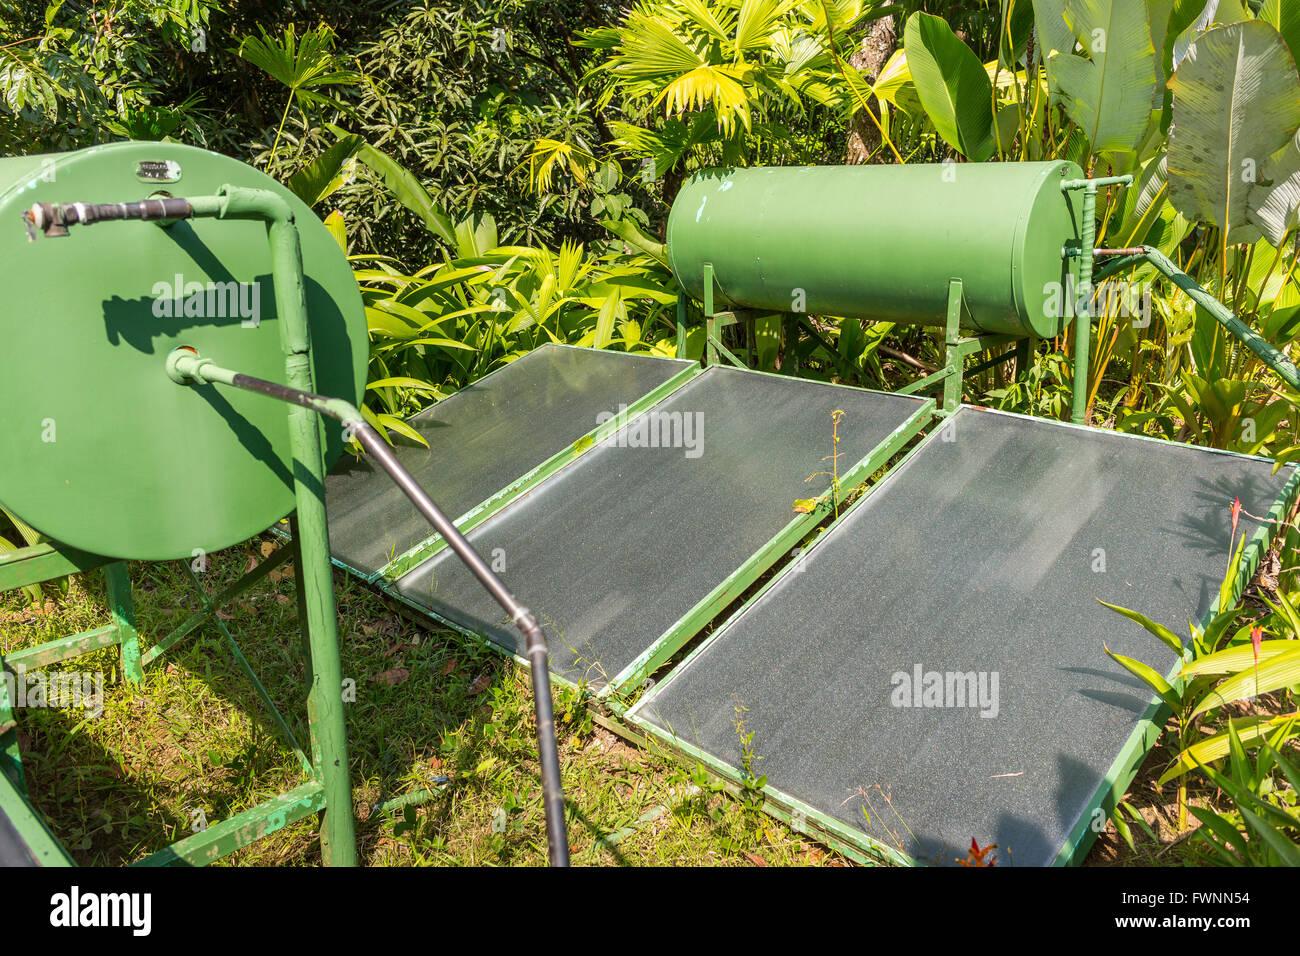 Solar Water Heater Stock Photos & Solar Water Heater Stock Images